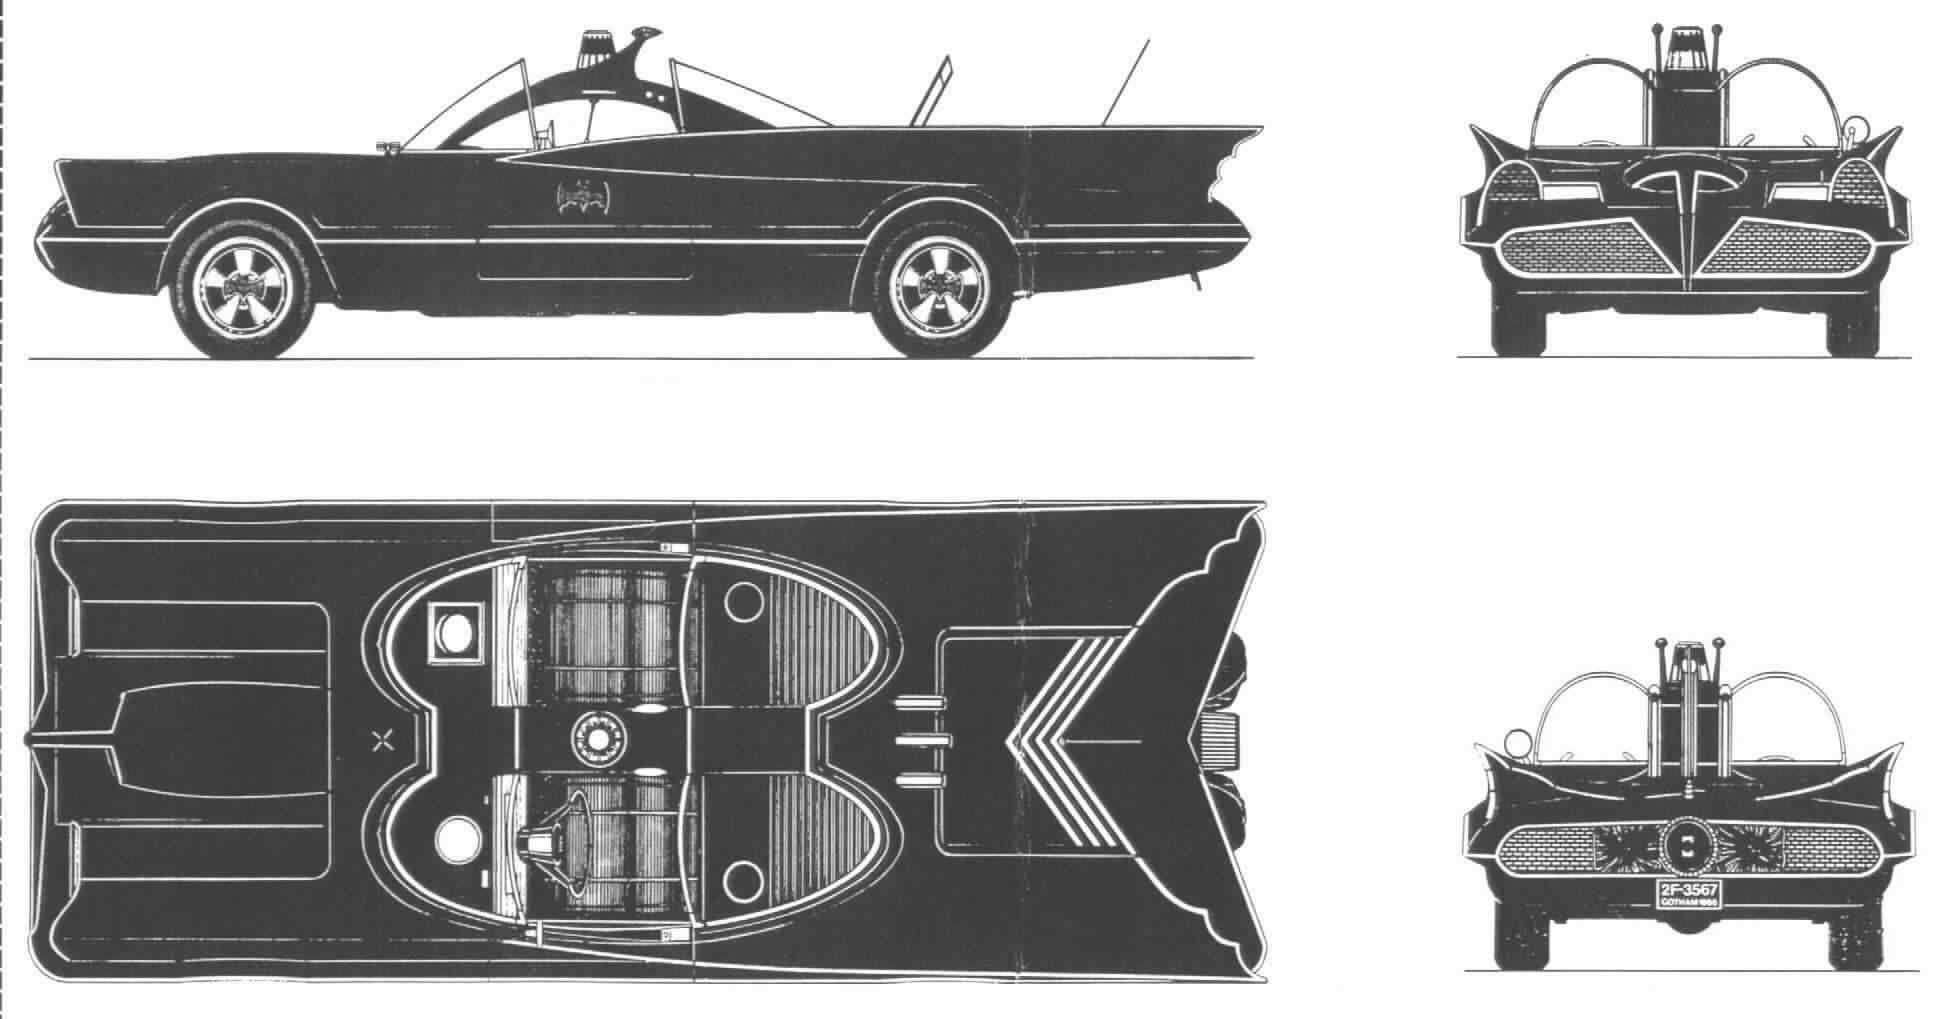 Batmobile blueprint descriptionbatmobile old car mecnica batmobile blueprint descriptionbatmobile old car malvernweather Choice Image